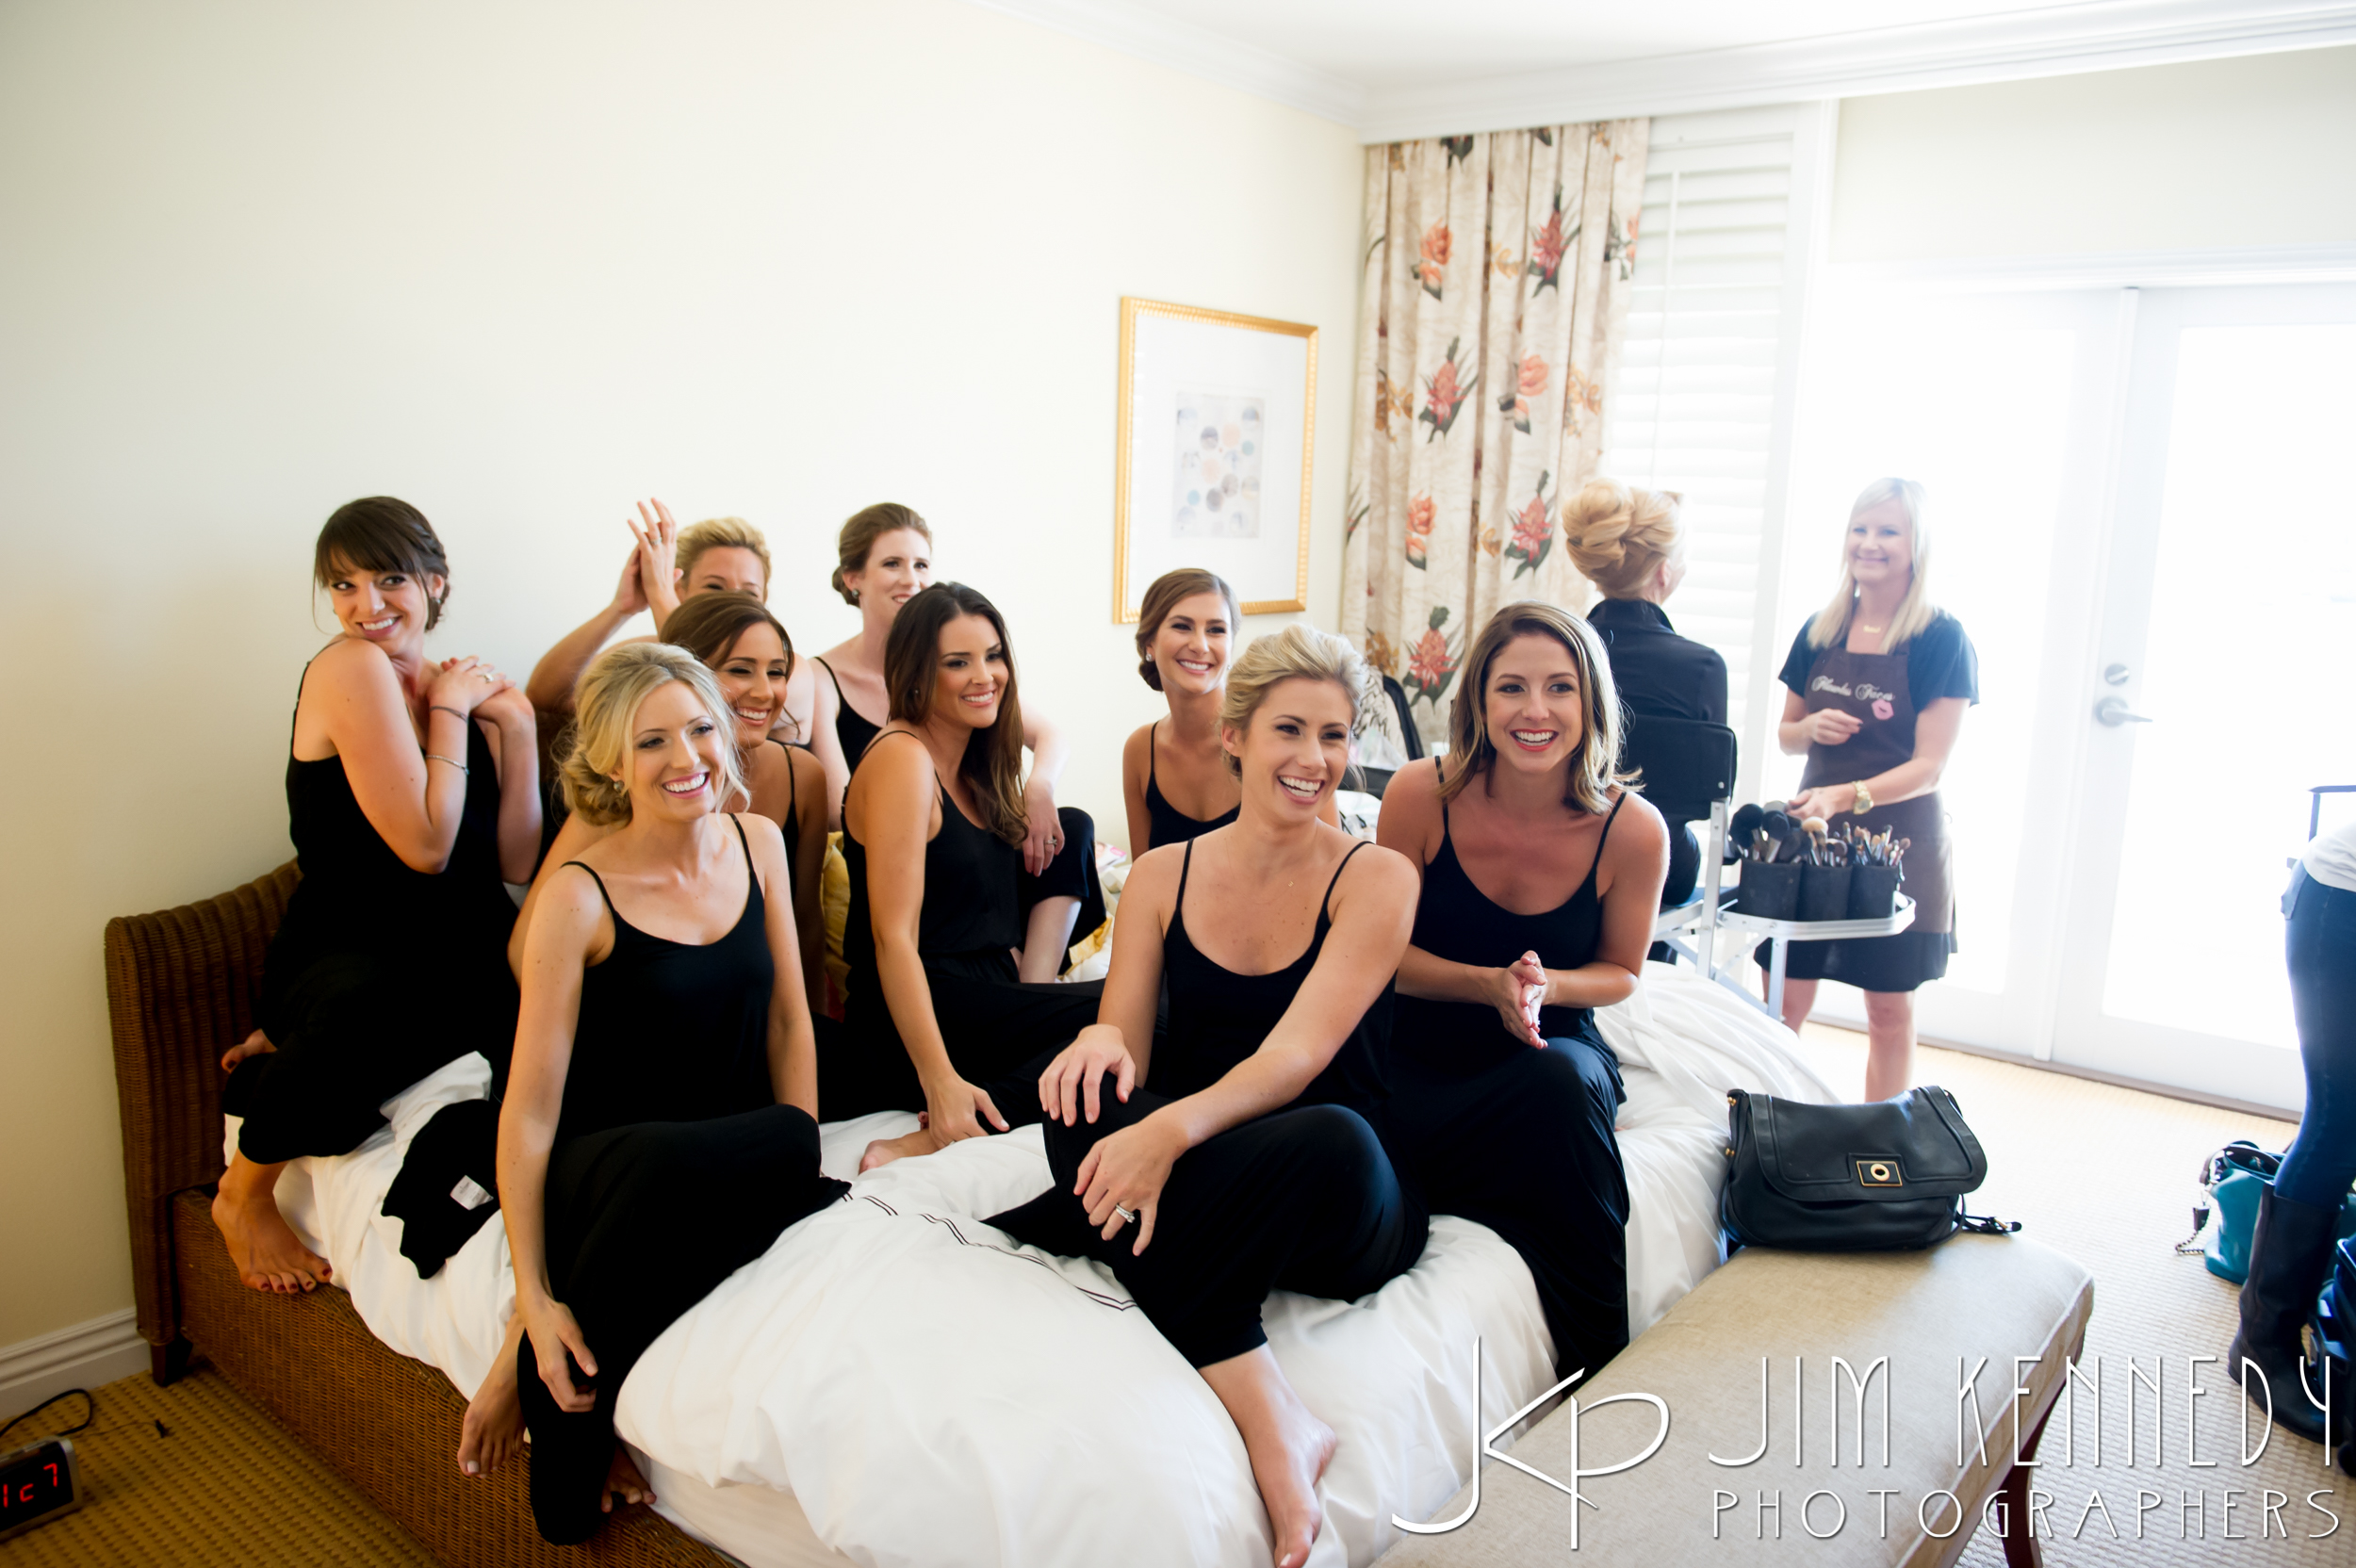 balboa-bay-resort-wedding-photography_0004.JPG